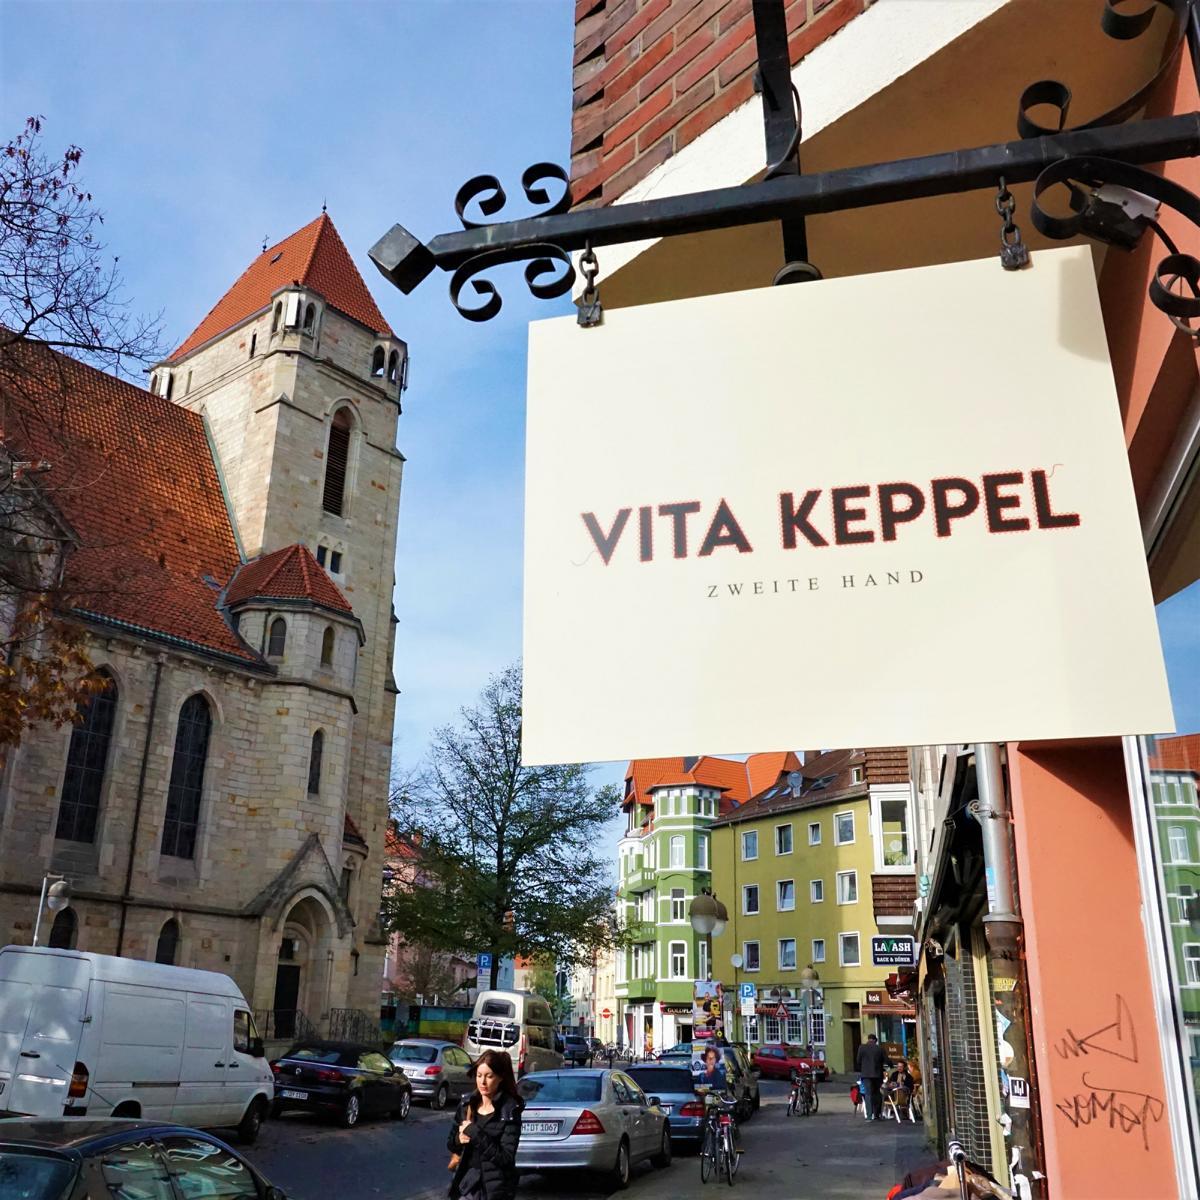 Style Hannover Vita Keppel INSTA 1 - Stylische Second Hand-Läden in Hannover